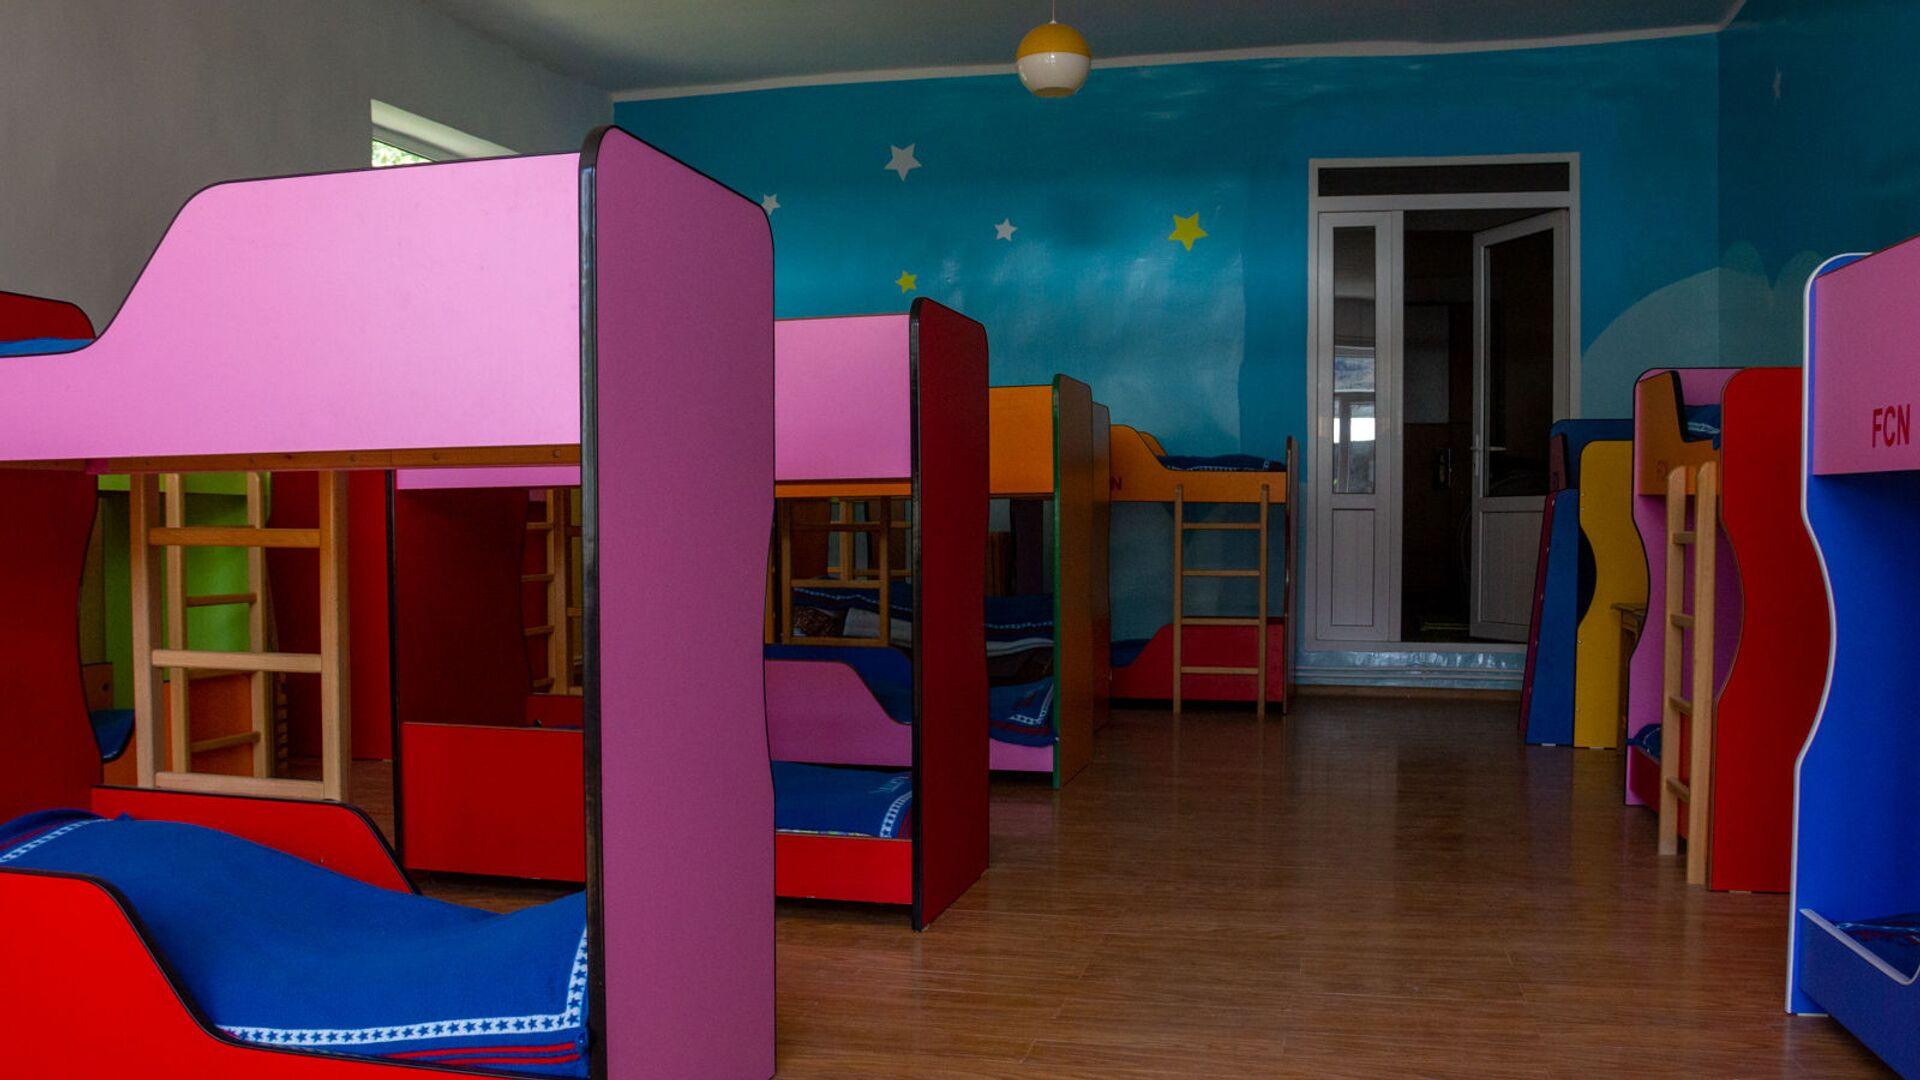 Детский сад общины Айгепар Тавушской области - Sputnik Արմենիա, 1920, 09.06.2021